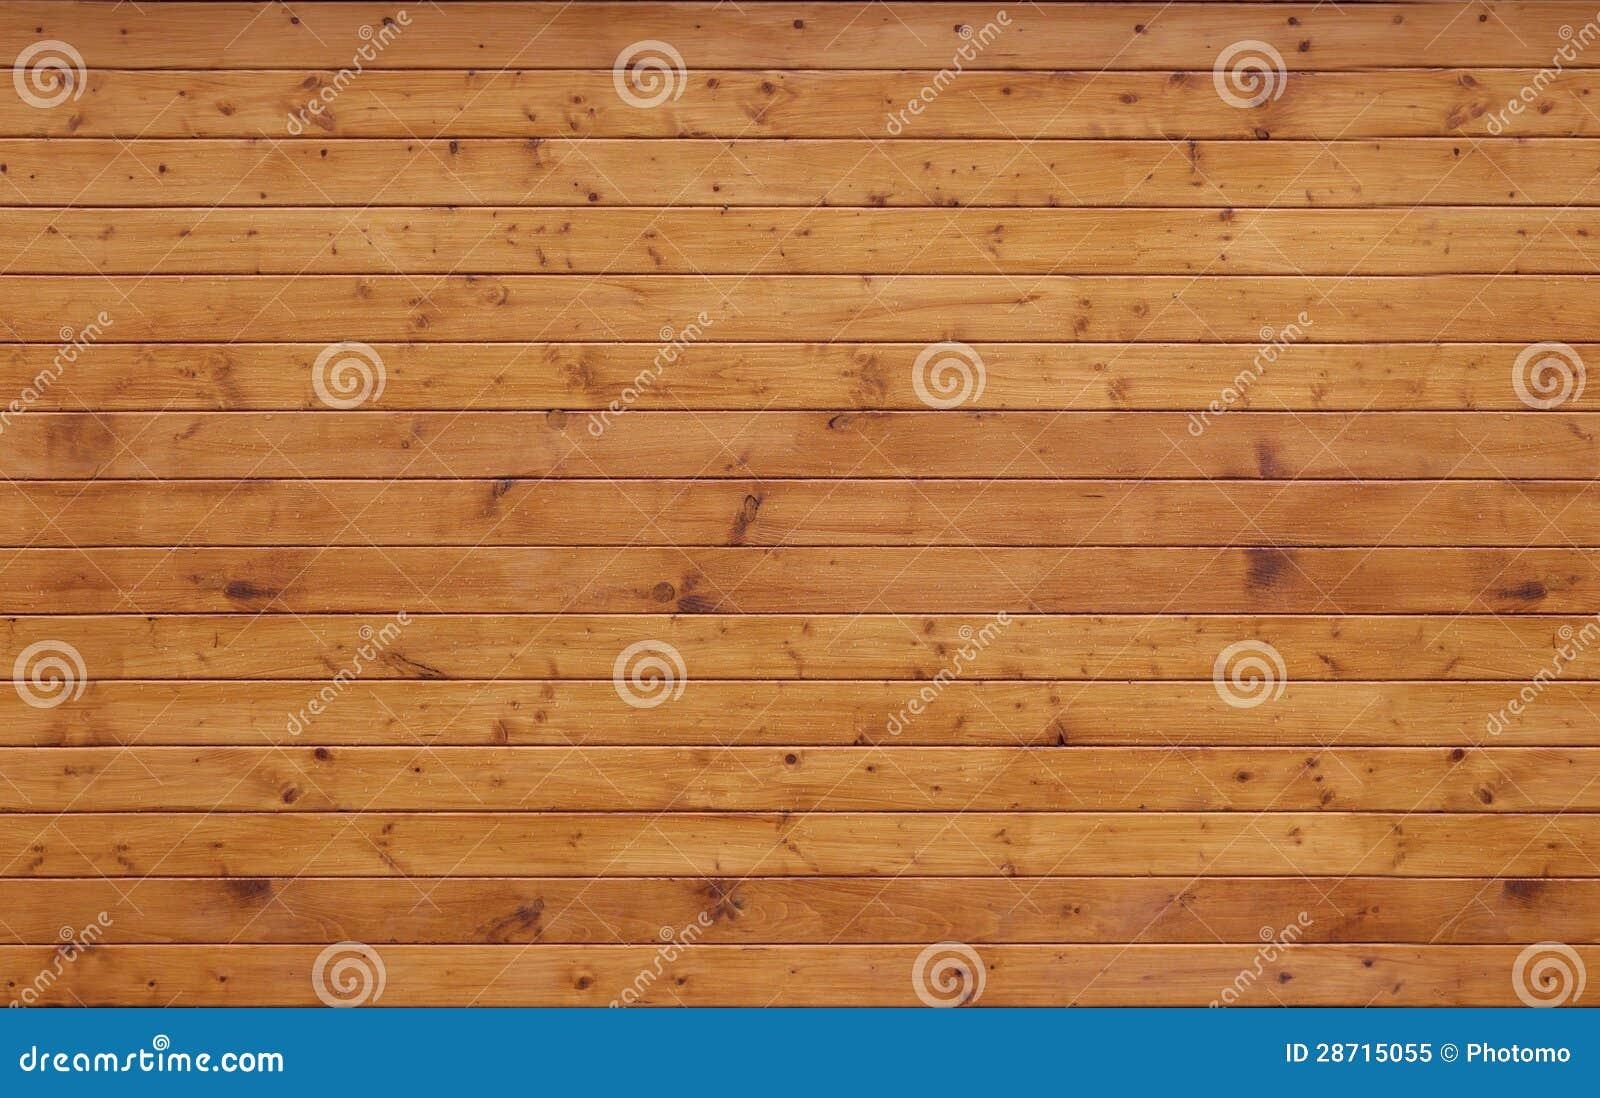 Mokrej Drewnianej tekstury tilable HQ